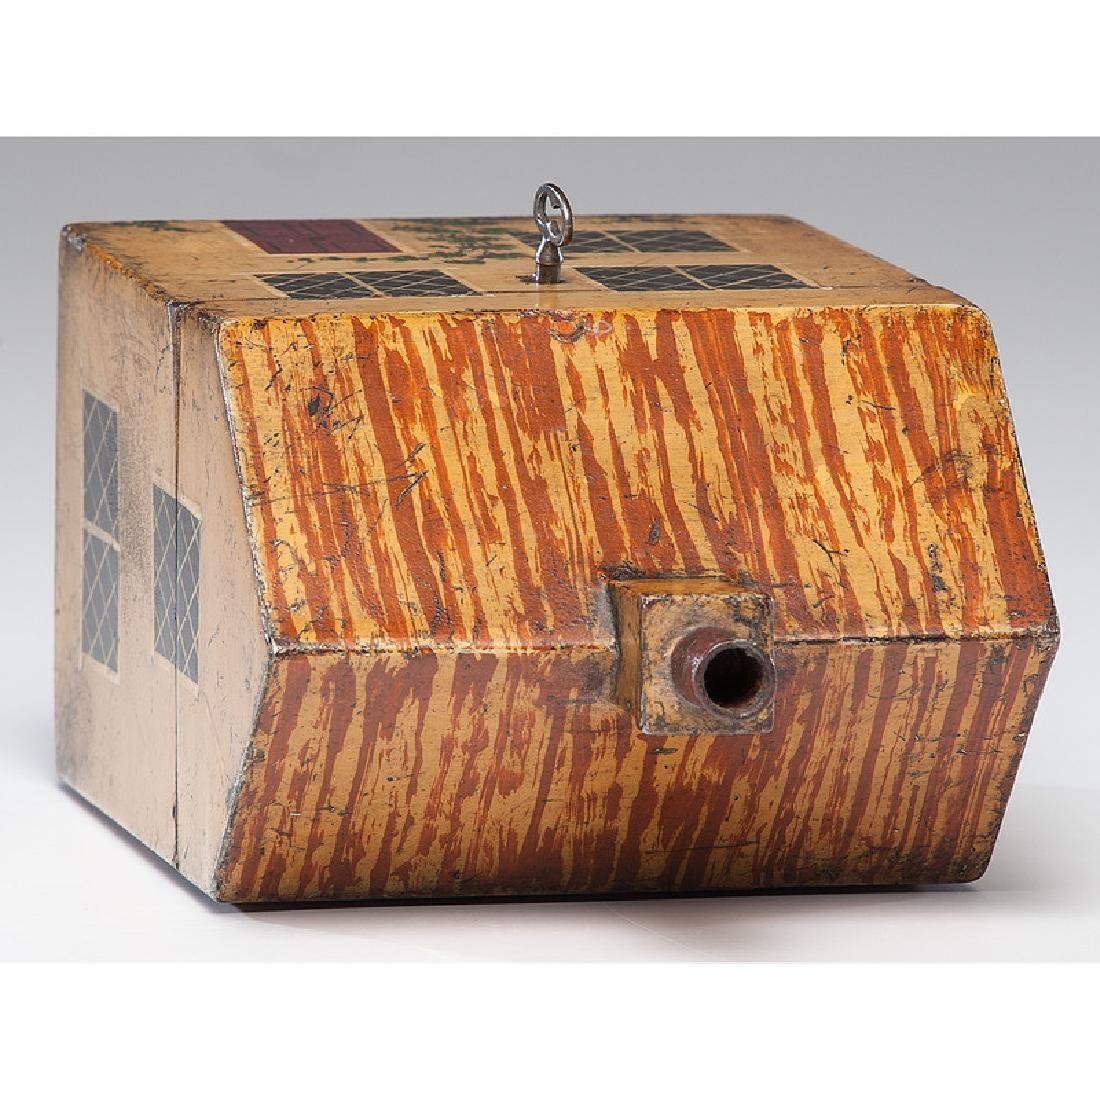 Rare Toleware Cottage Form Tea Caddy - 6